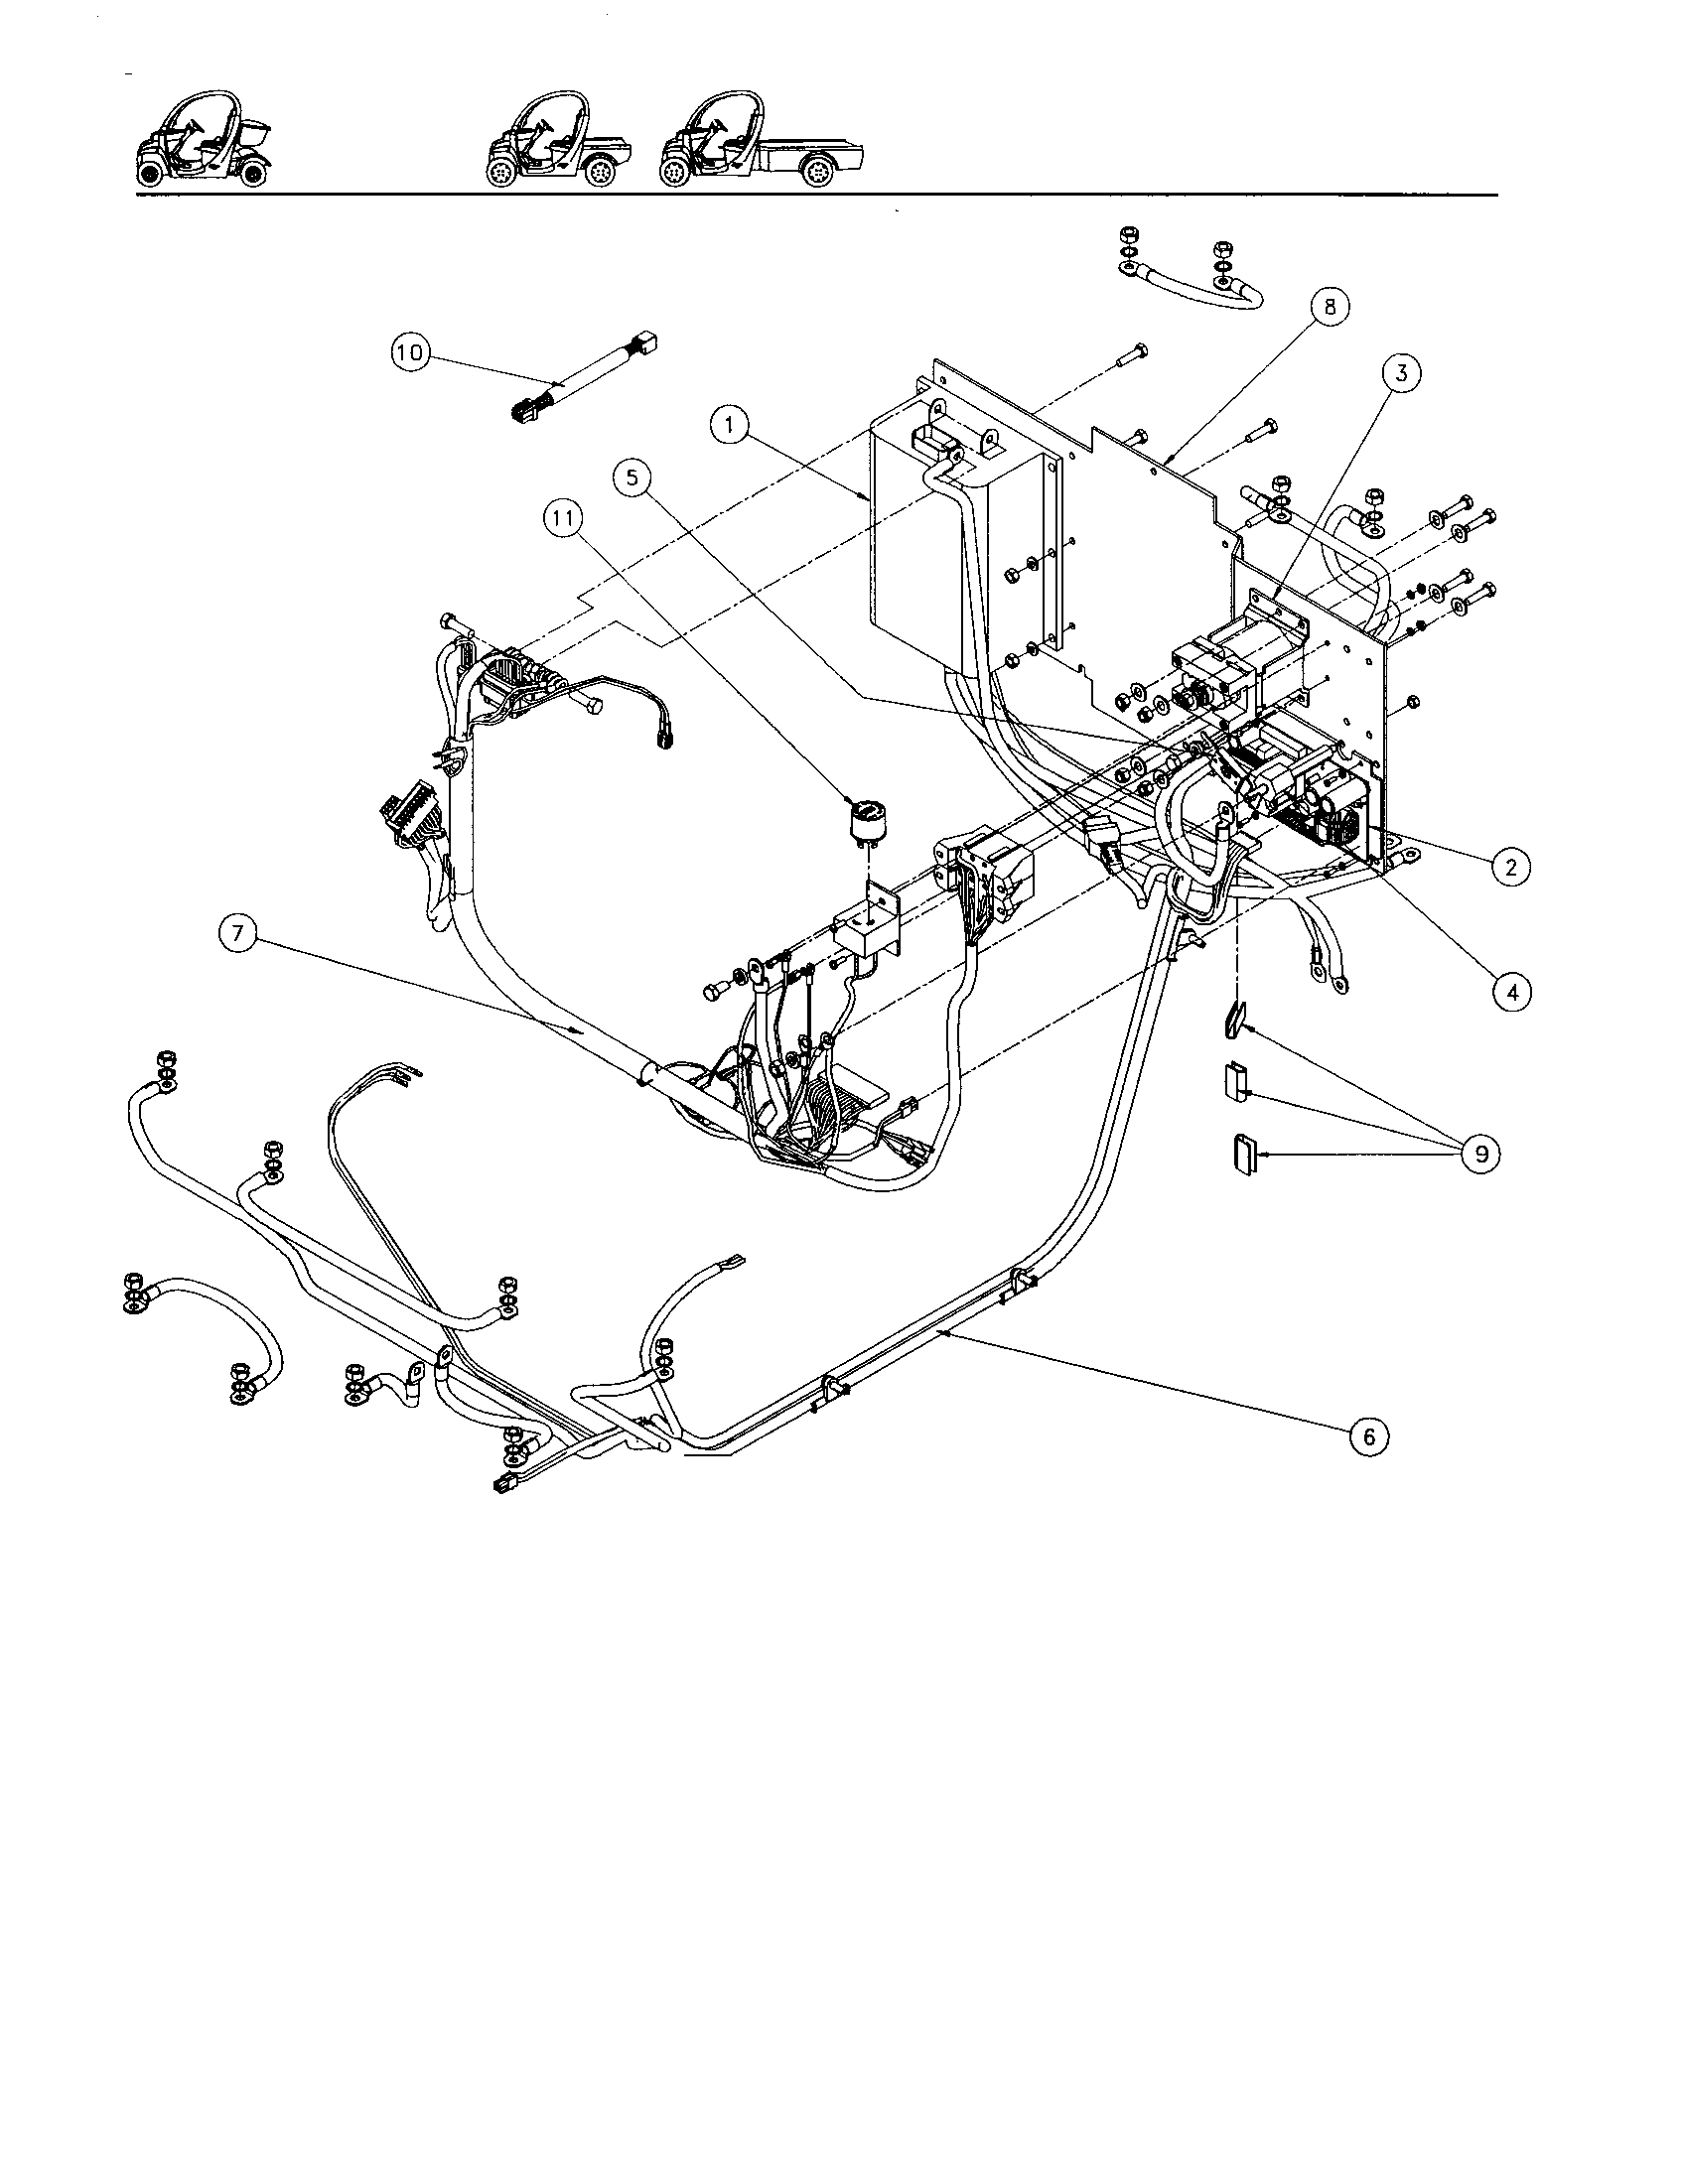 FK_3765] Electric Gem Car Wiring Diagram 2000 Schematic Wiring | Gem Golf Car Wiring Diagram |  | Exmet Ophag Trons Mohammedshrine Librar Wiring 101